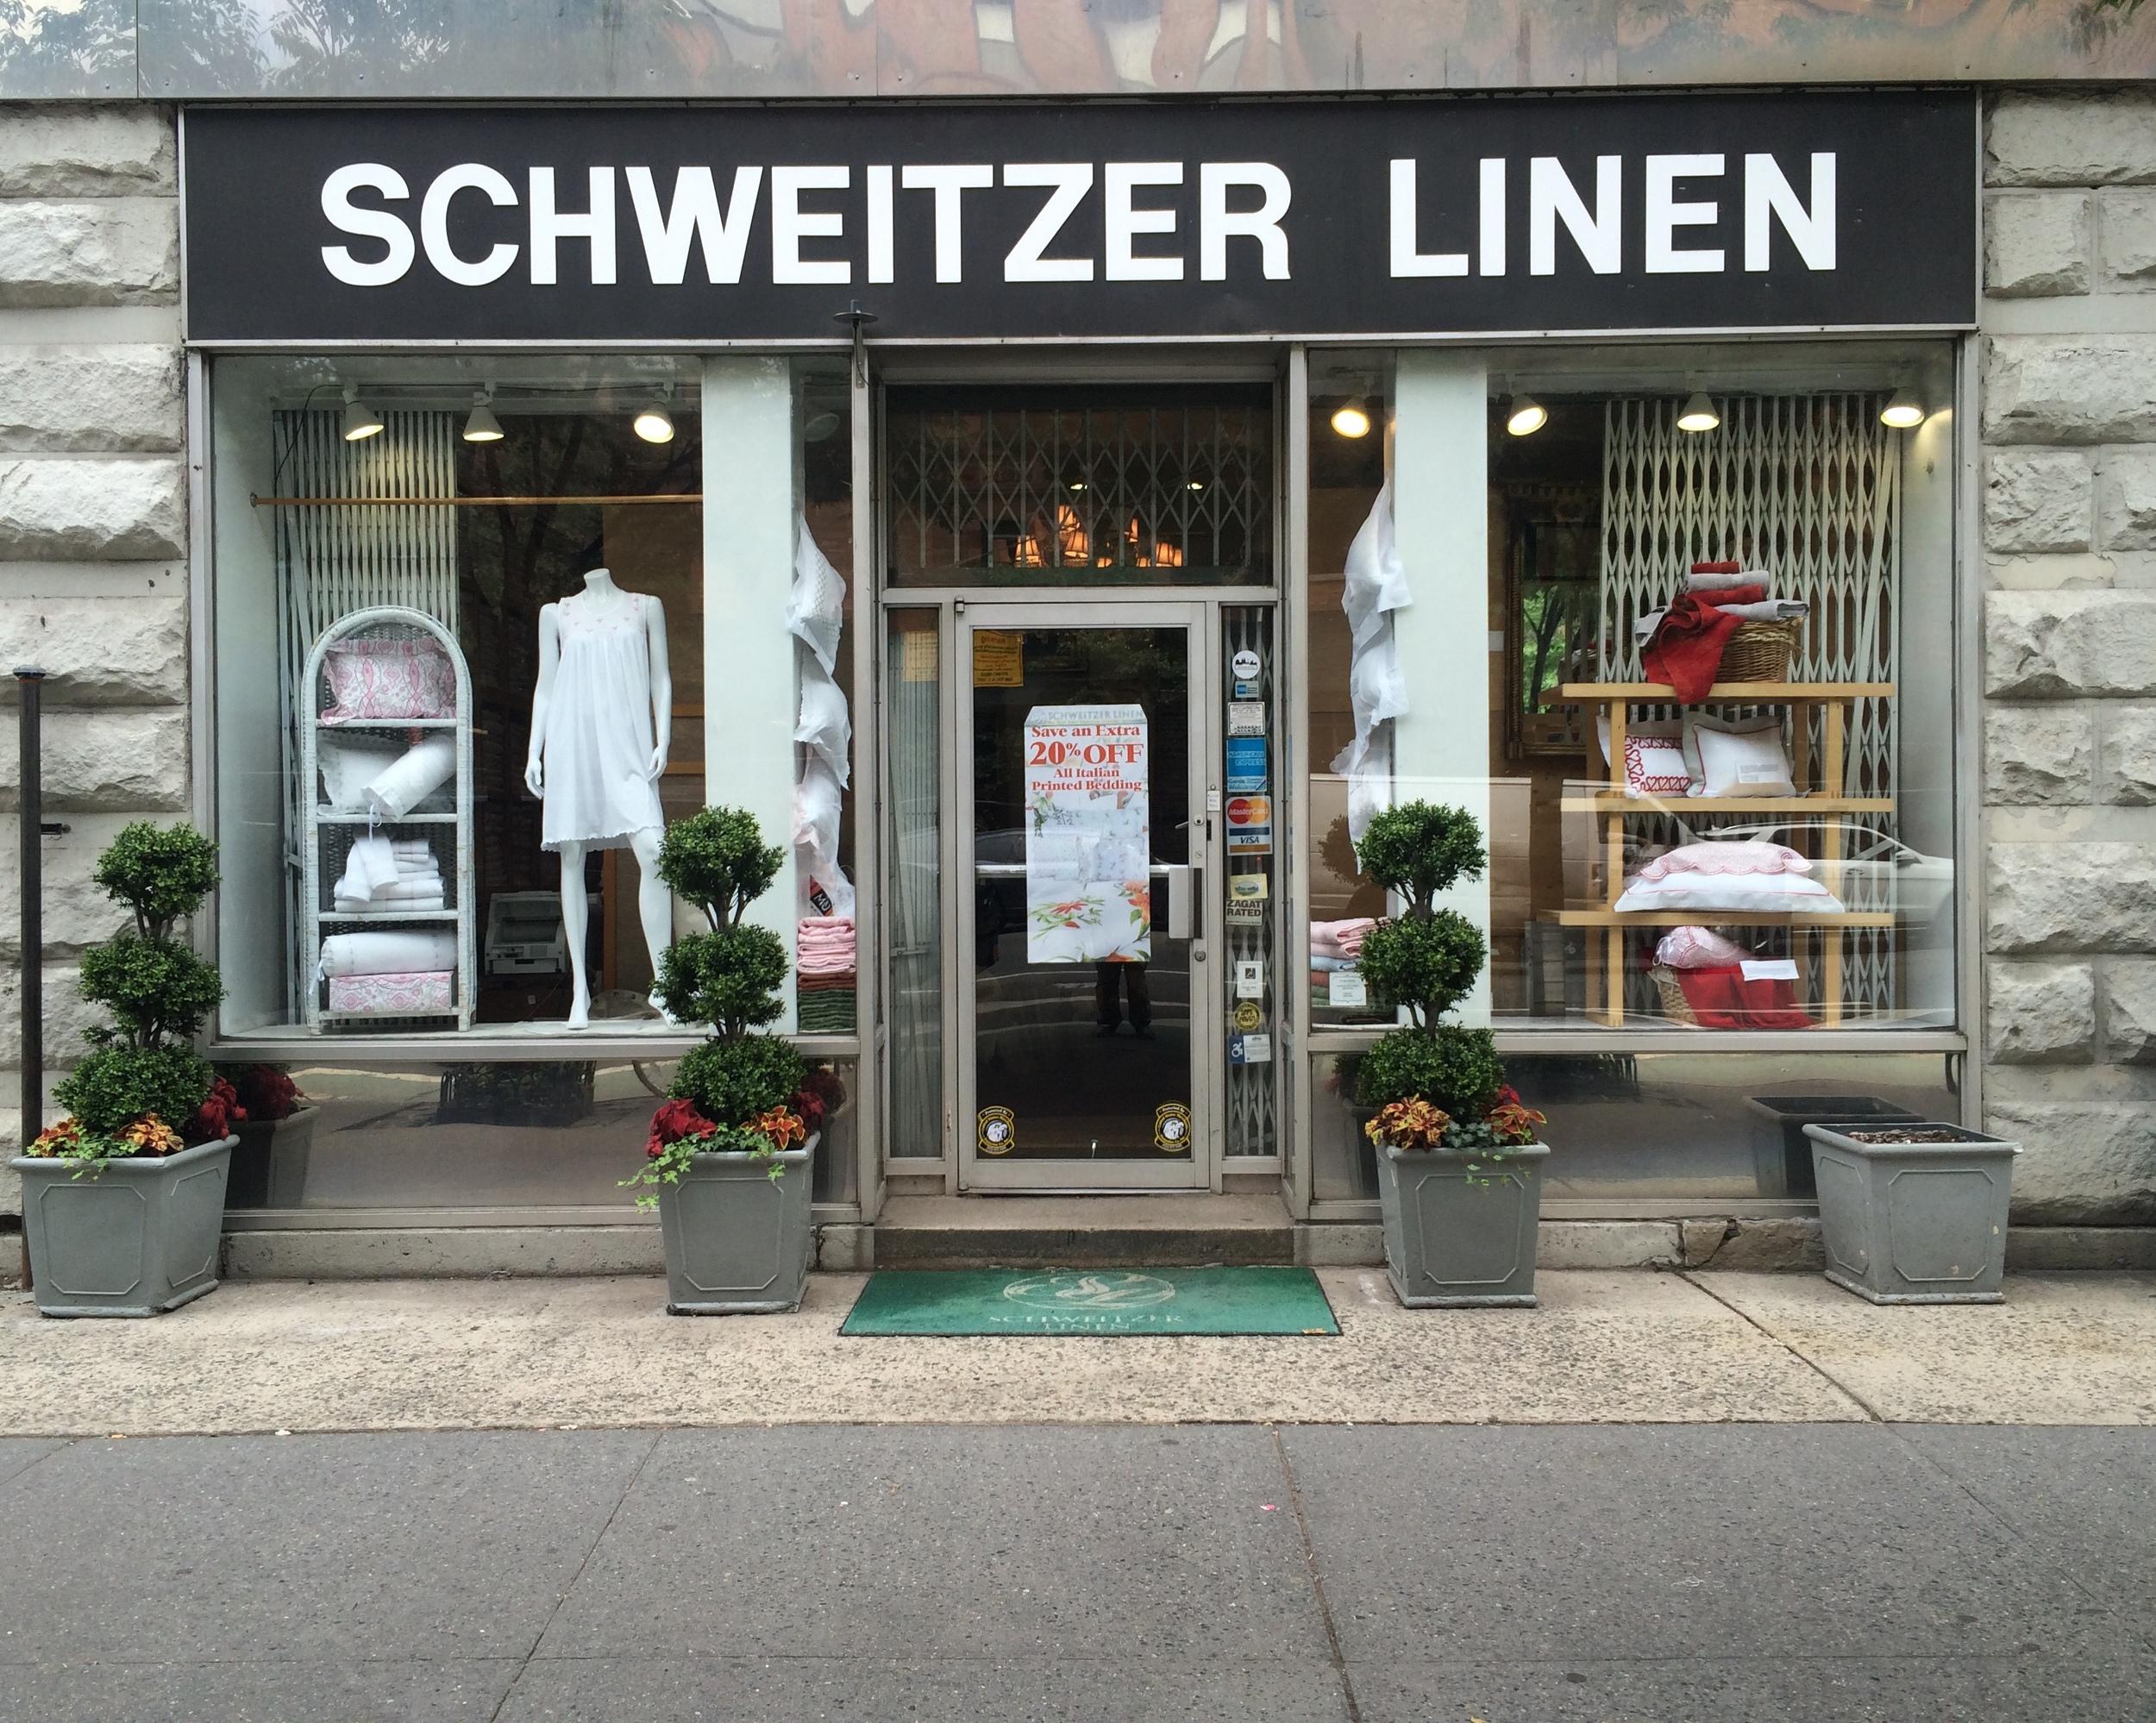 Schweitzer Linen - 457 Columbus Avenue (Between 81st and 82nd Street)